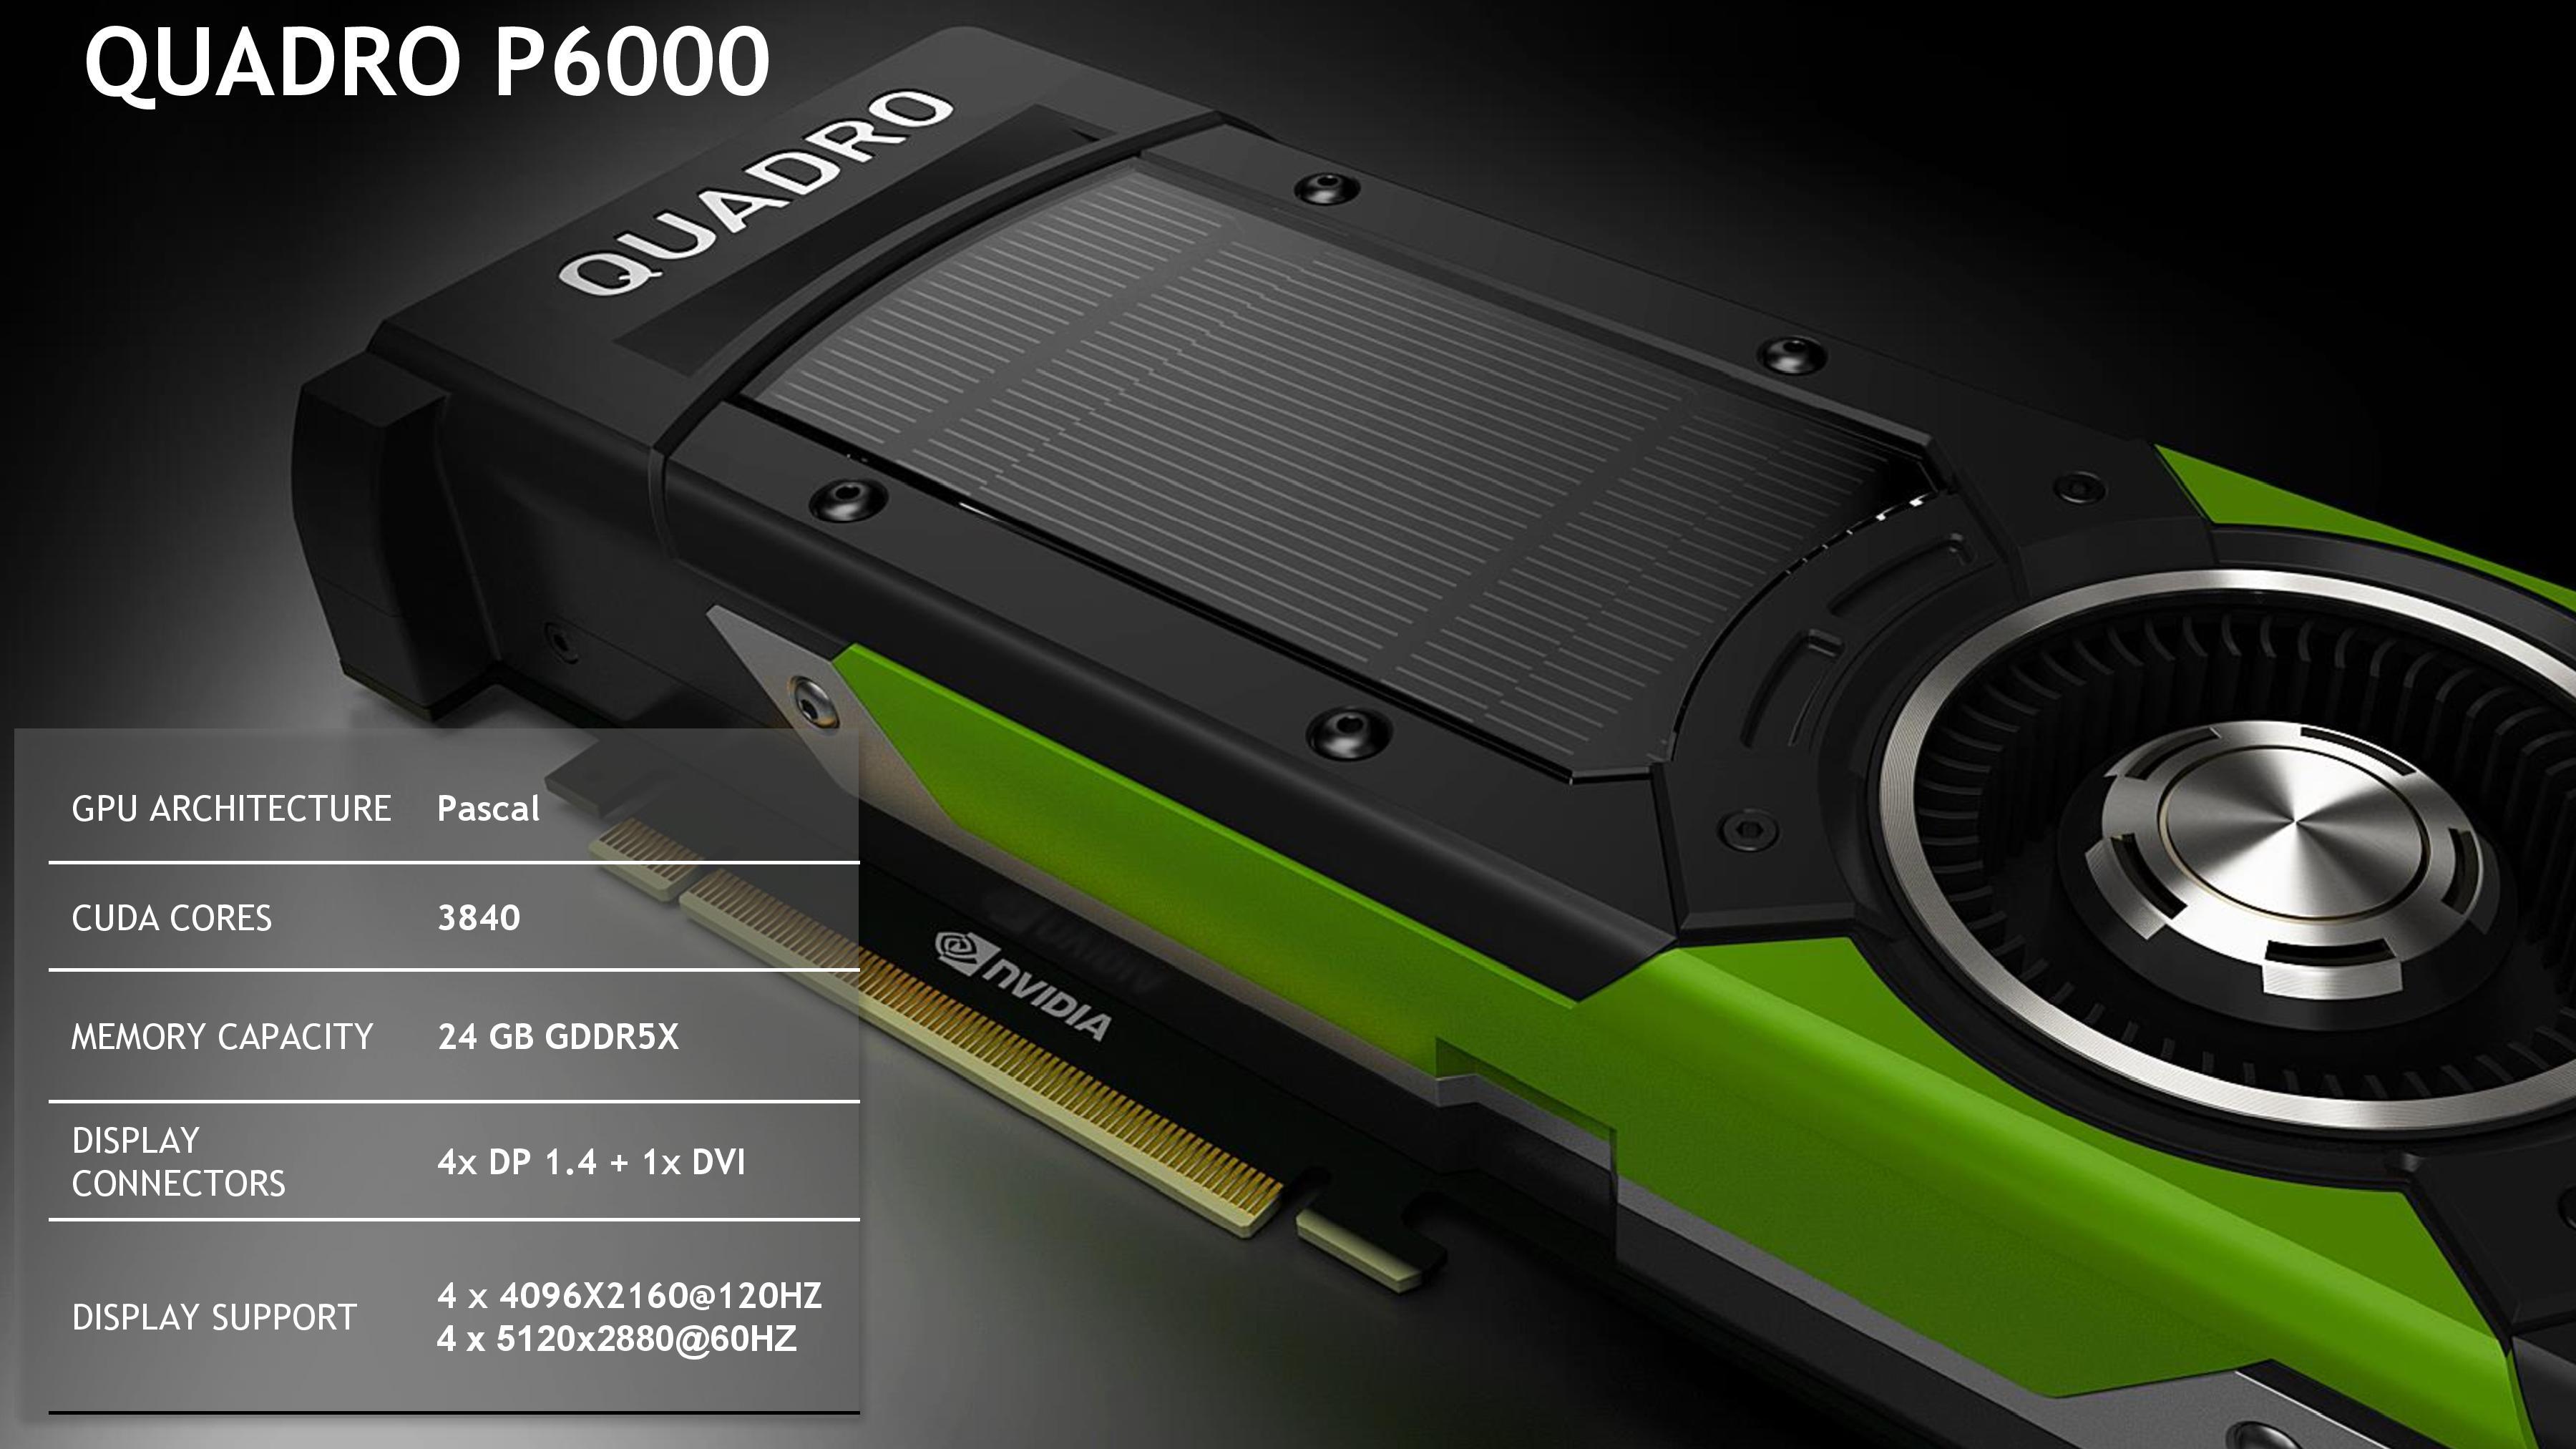 NVIDIA Announces Quadro Pascal Family: Quadro P6000 & P5000